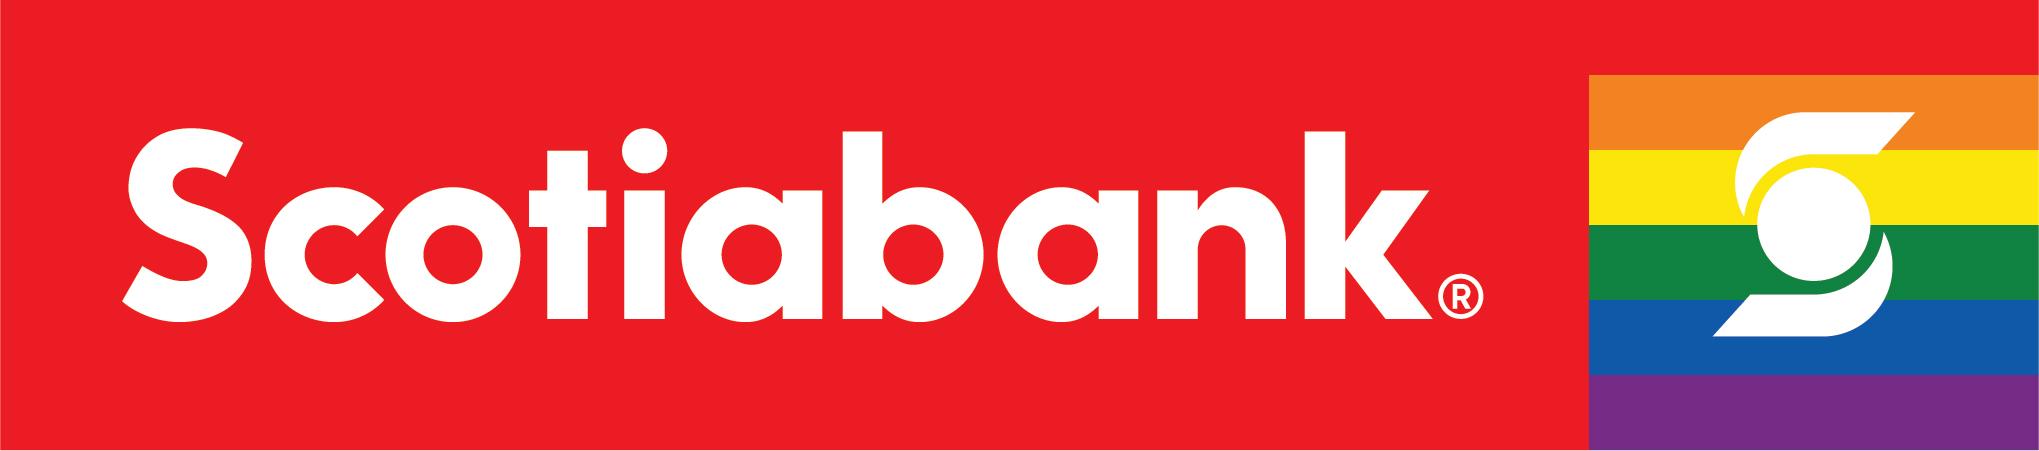 Scotiabank rainbow logo